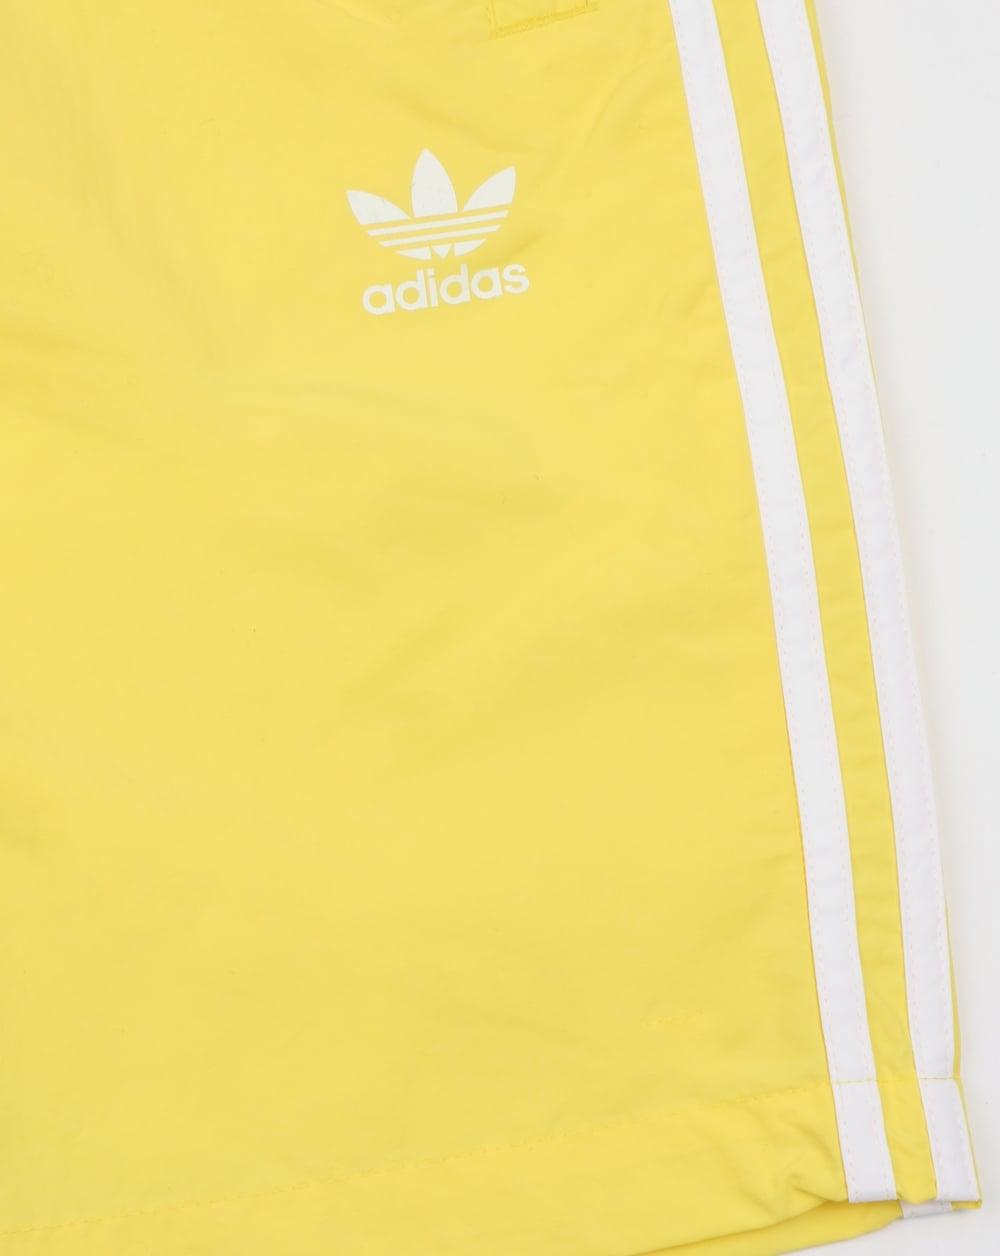 22502d4767 Adidas Originals 3 Stripes Swim Shorts Lemon,beach,swimmers,originals